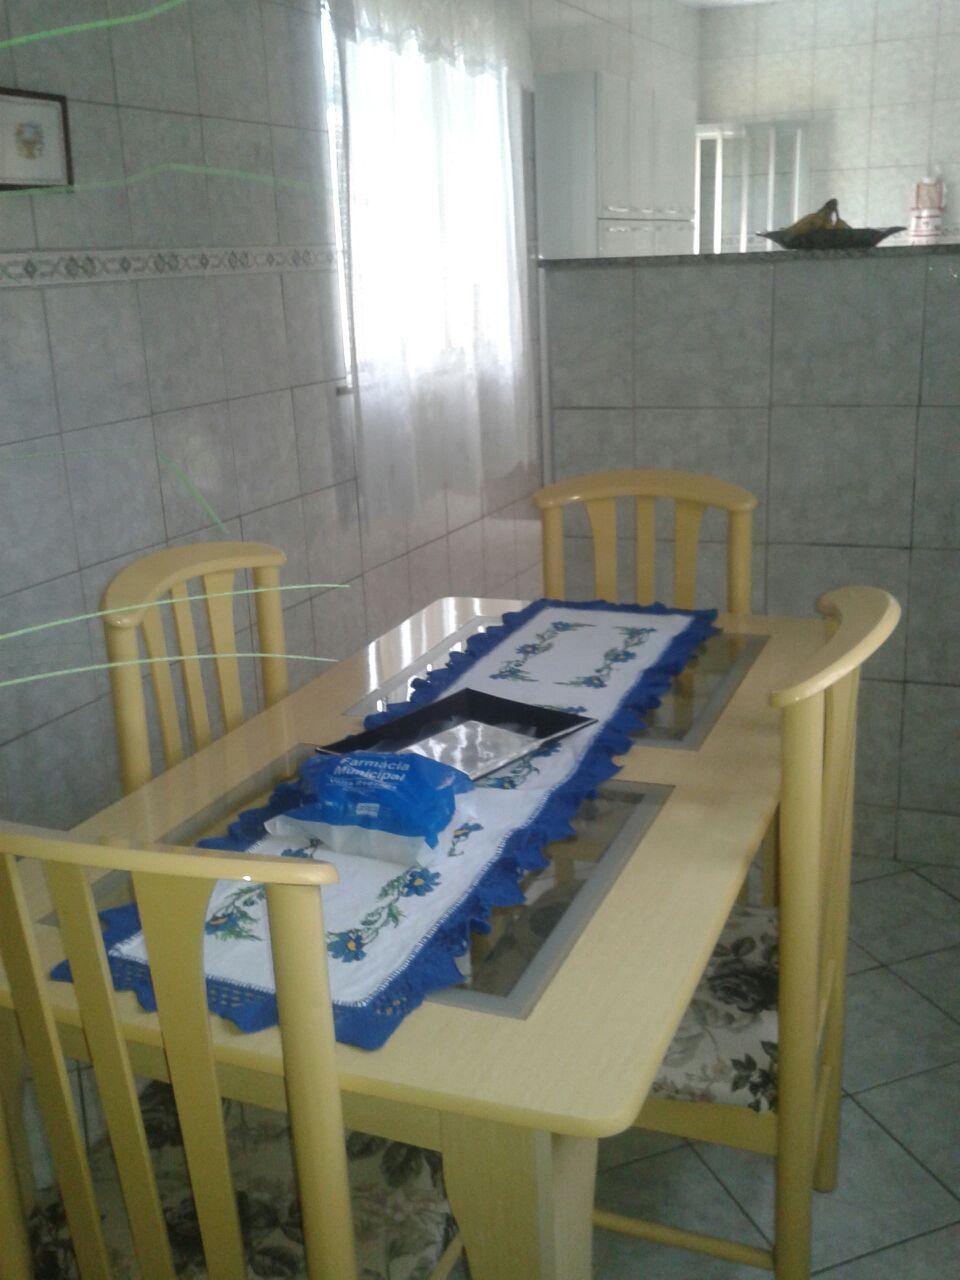 Venda De Casa Em Vila Santa Cecilia Em Volta Redonda-RJ